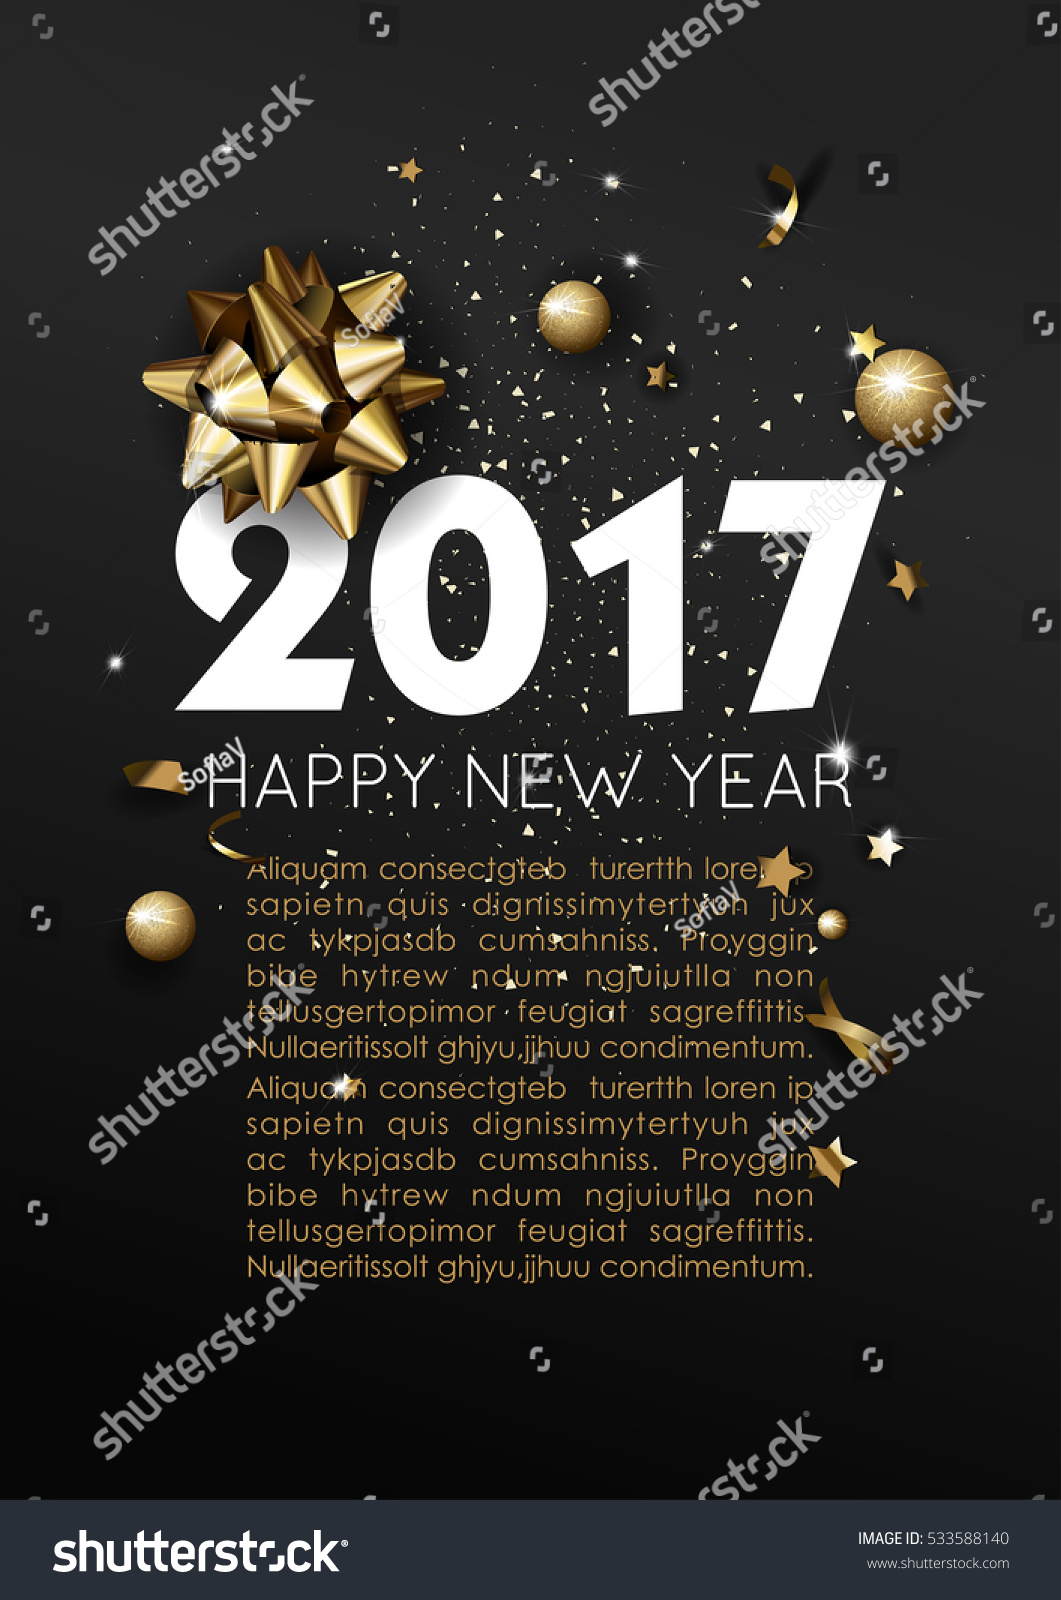 Happy New Year 2017 Greeting Card Stock Vektorgrafik 533588140